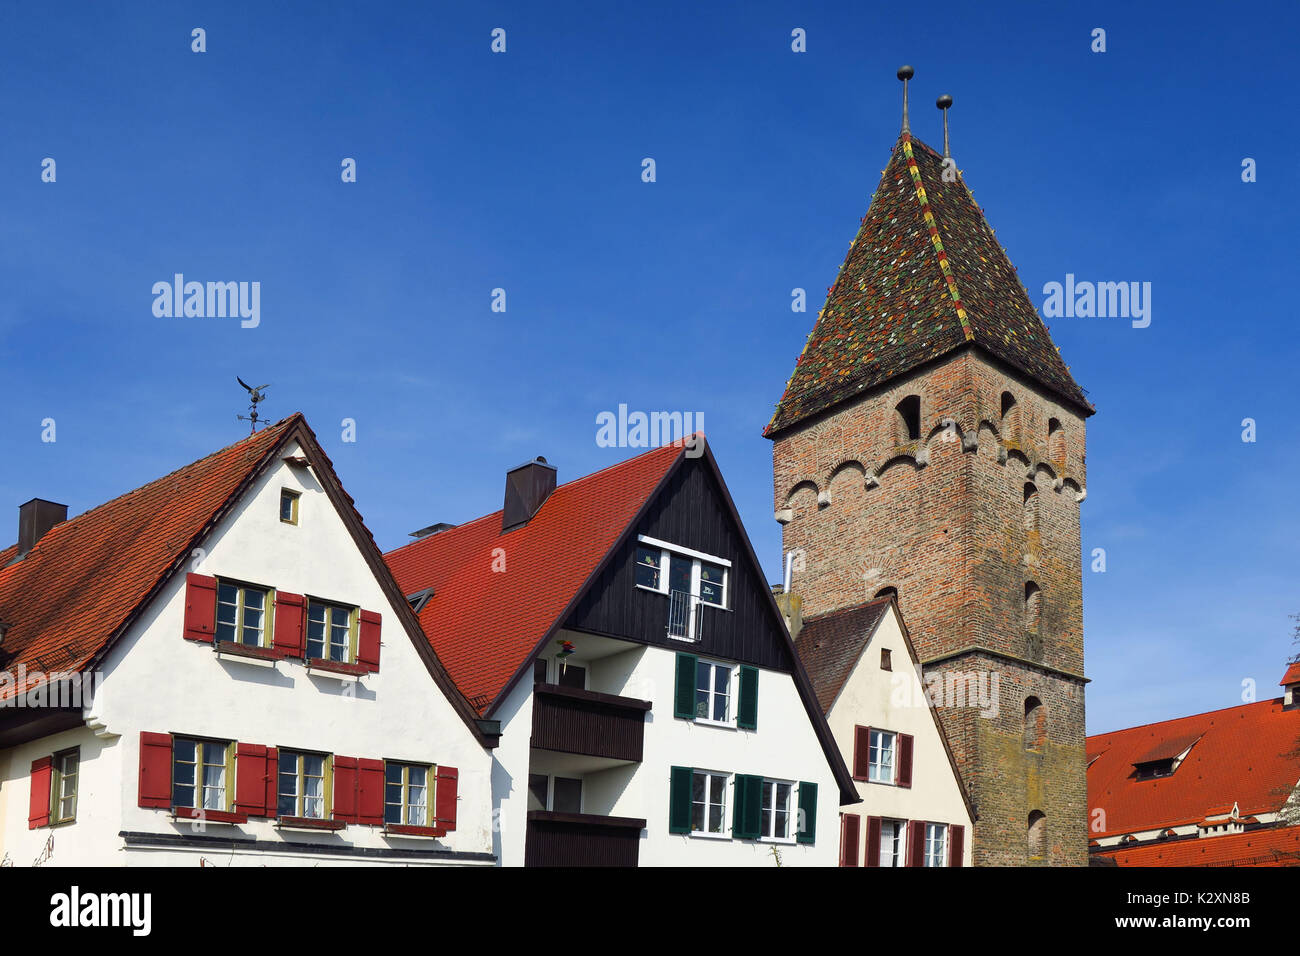 Ulm, Donau, Baden, Wuerttemberg, Bezirk Tuebingen, Metzgerturm, Stadtmauer, Wehrturm, Mittelalter - Stock Image